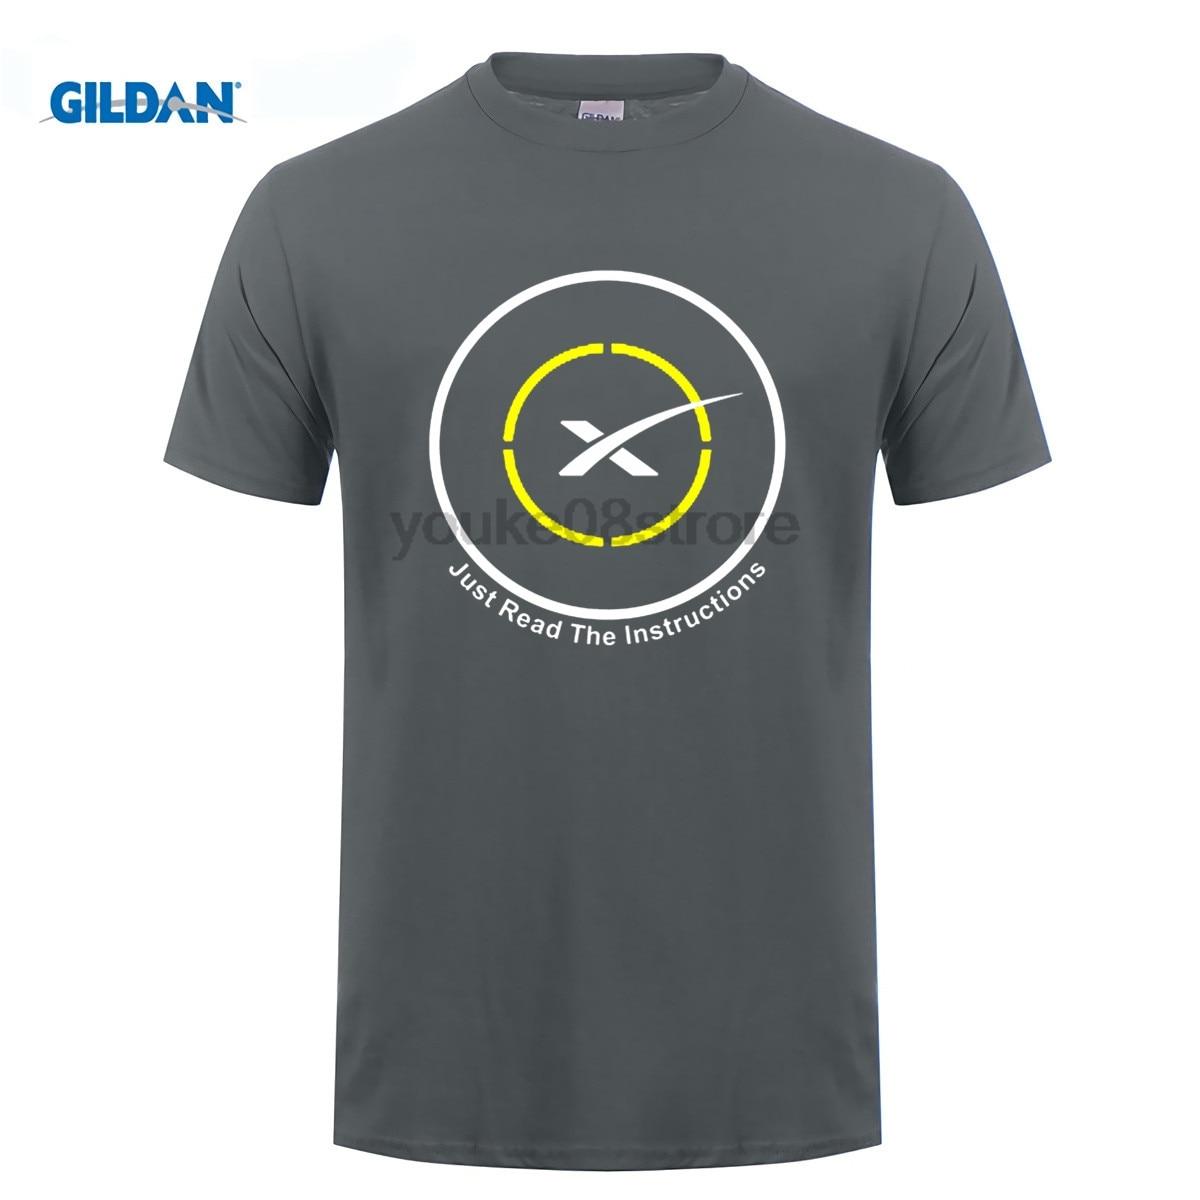 GILDAN Autonomous spaceport drone ship of SpaceX Just Read the Instructions T-Shirt Men  ...